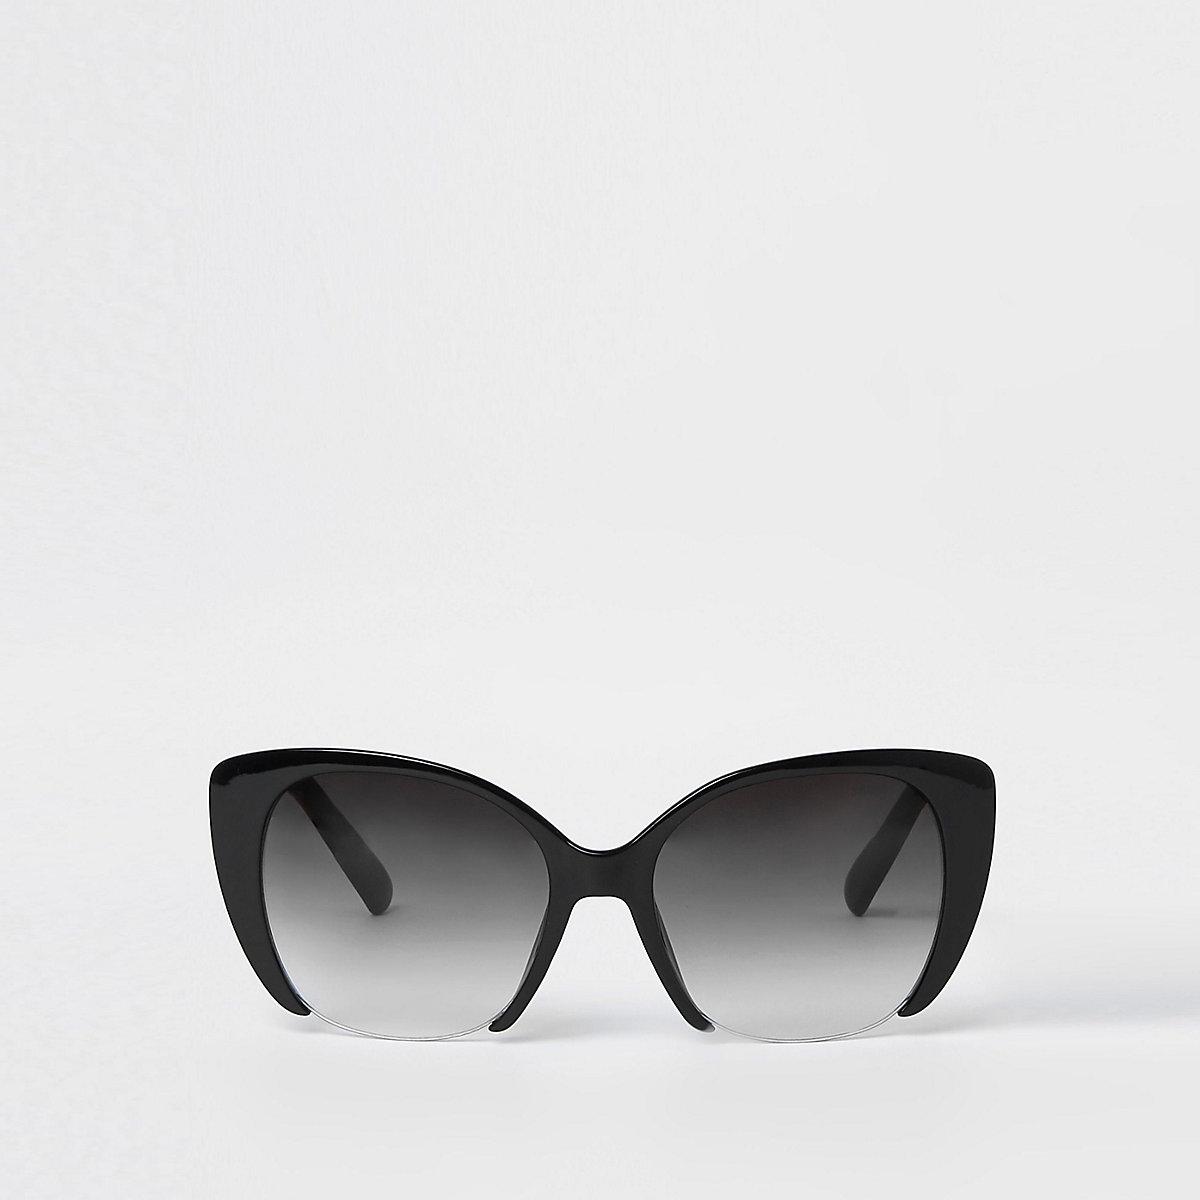 Black smoke lens cat eye glam sunglasses